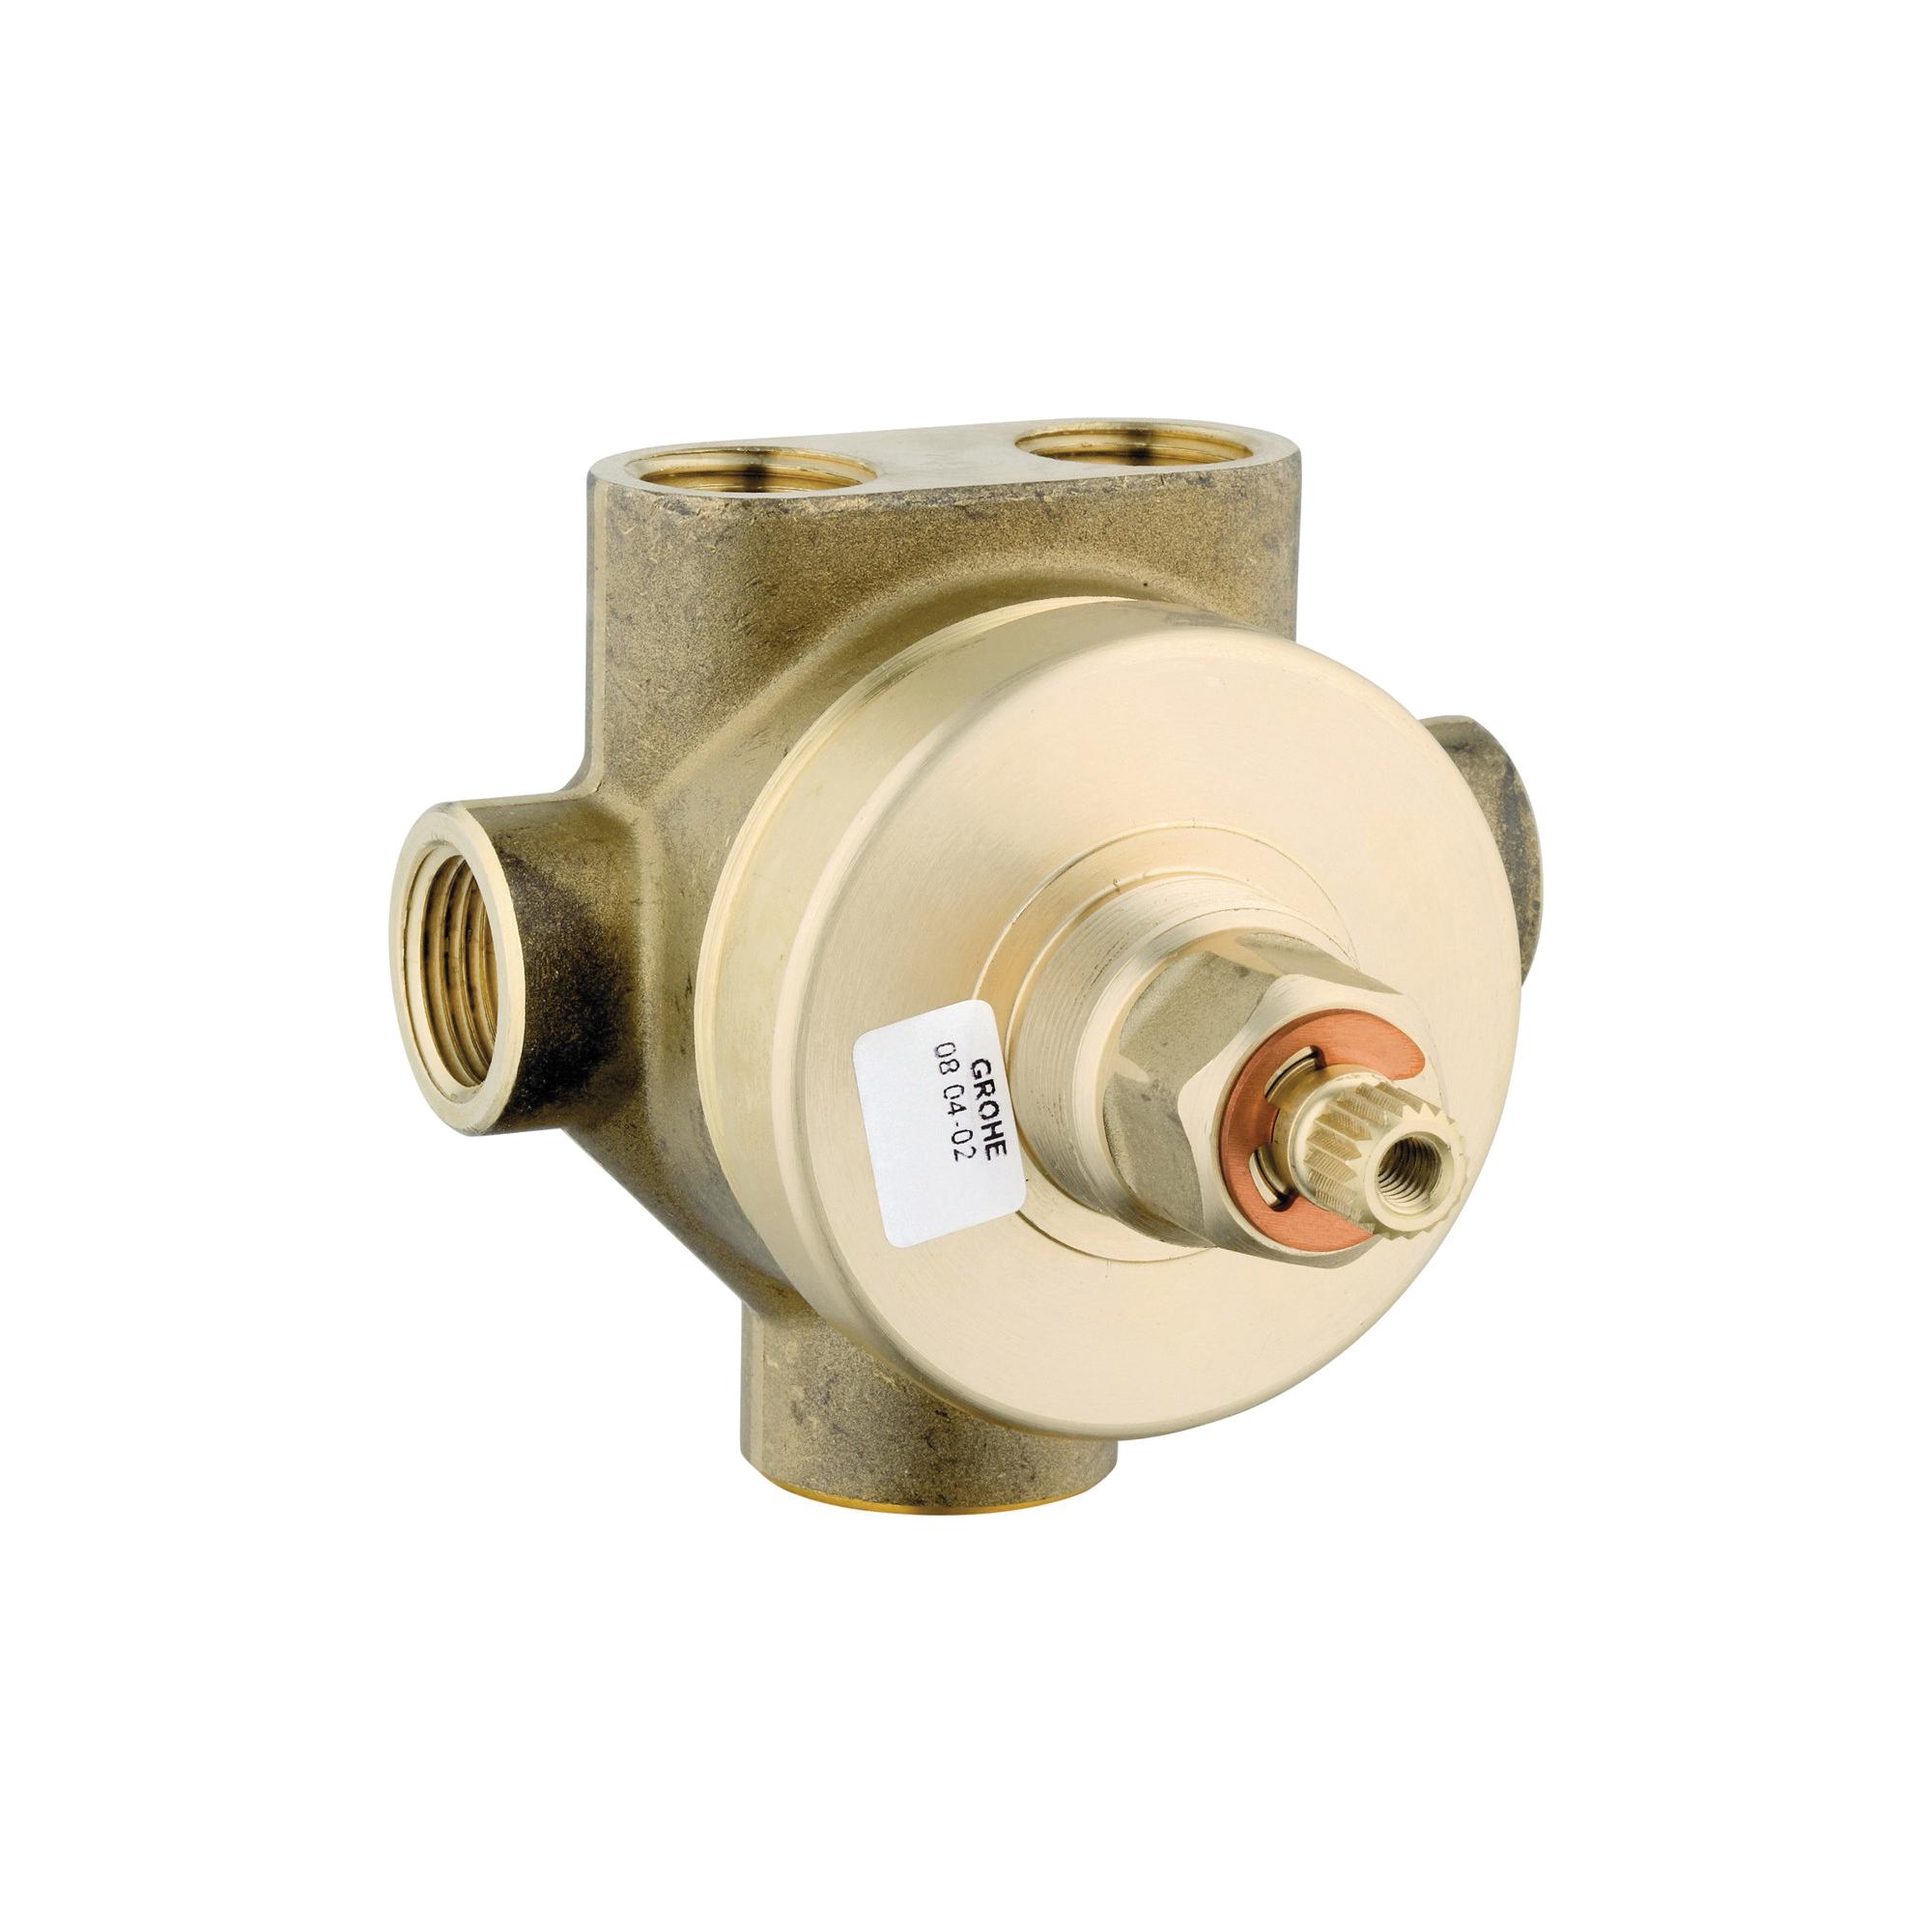 GROHE 29035000 5-Port Diverter Rough-In Valve, 1/2 in FNPT Inlet x 1/2 in FNPT Outlet, 3 Ways, Brass Body, Import